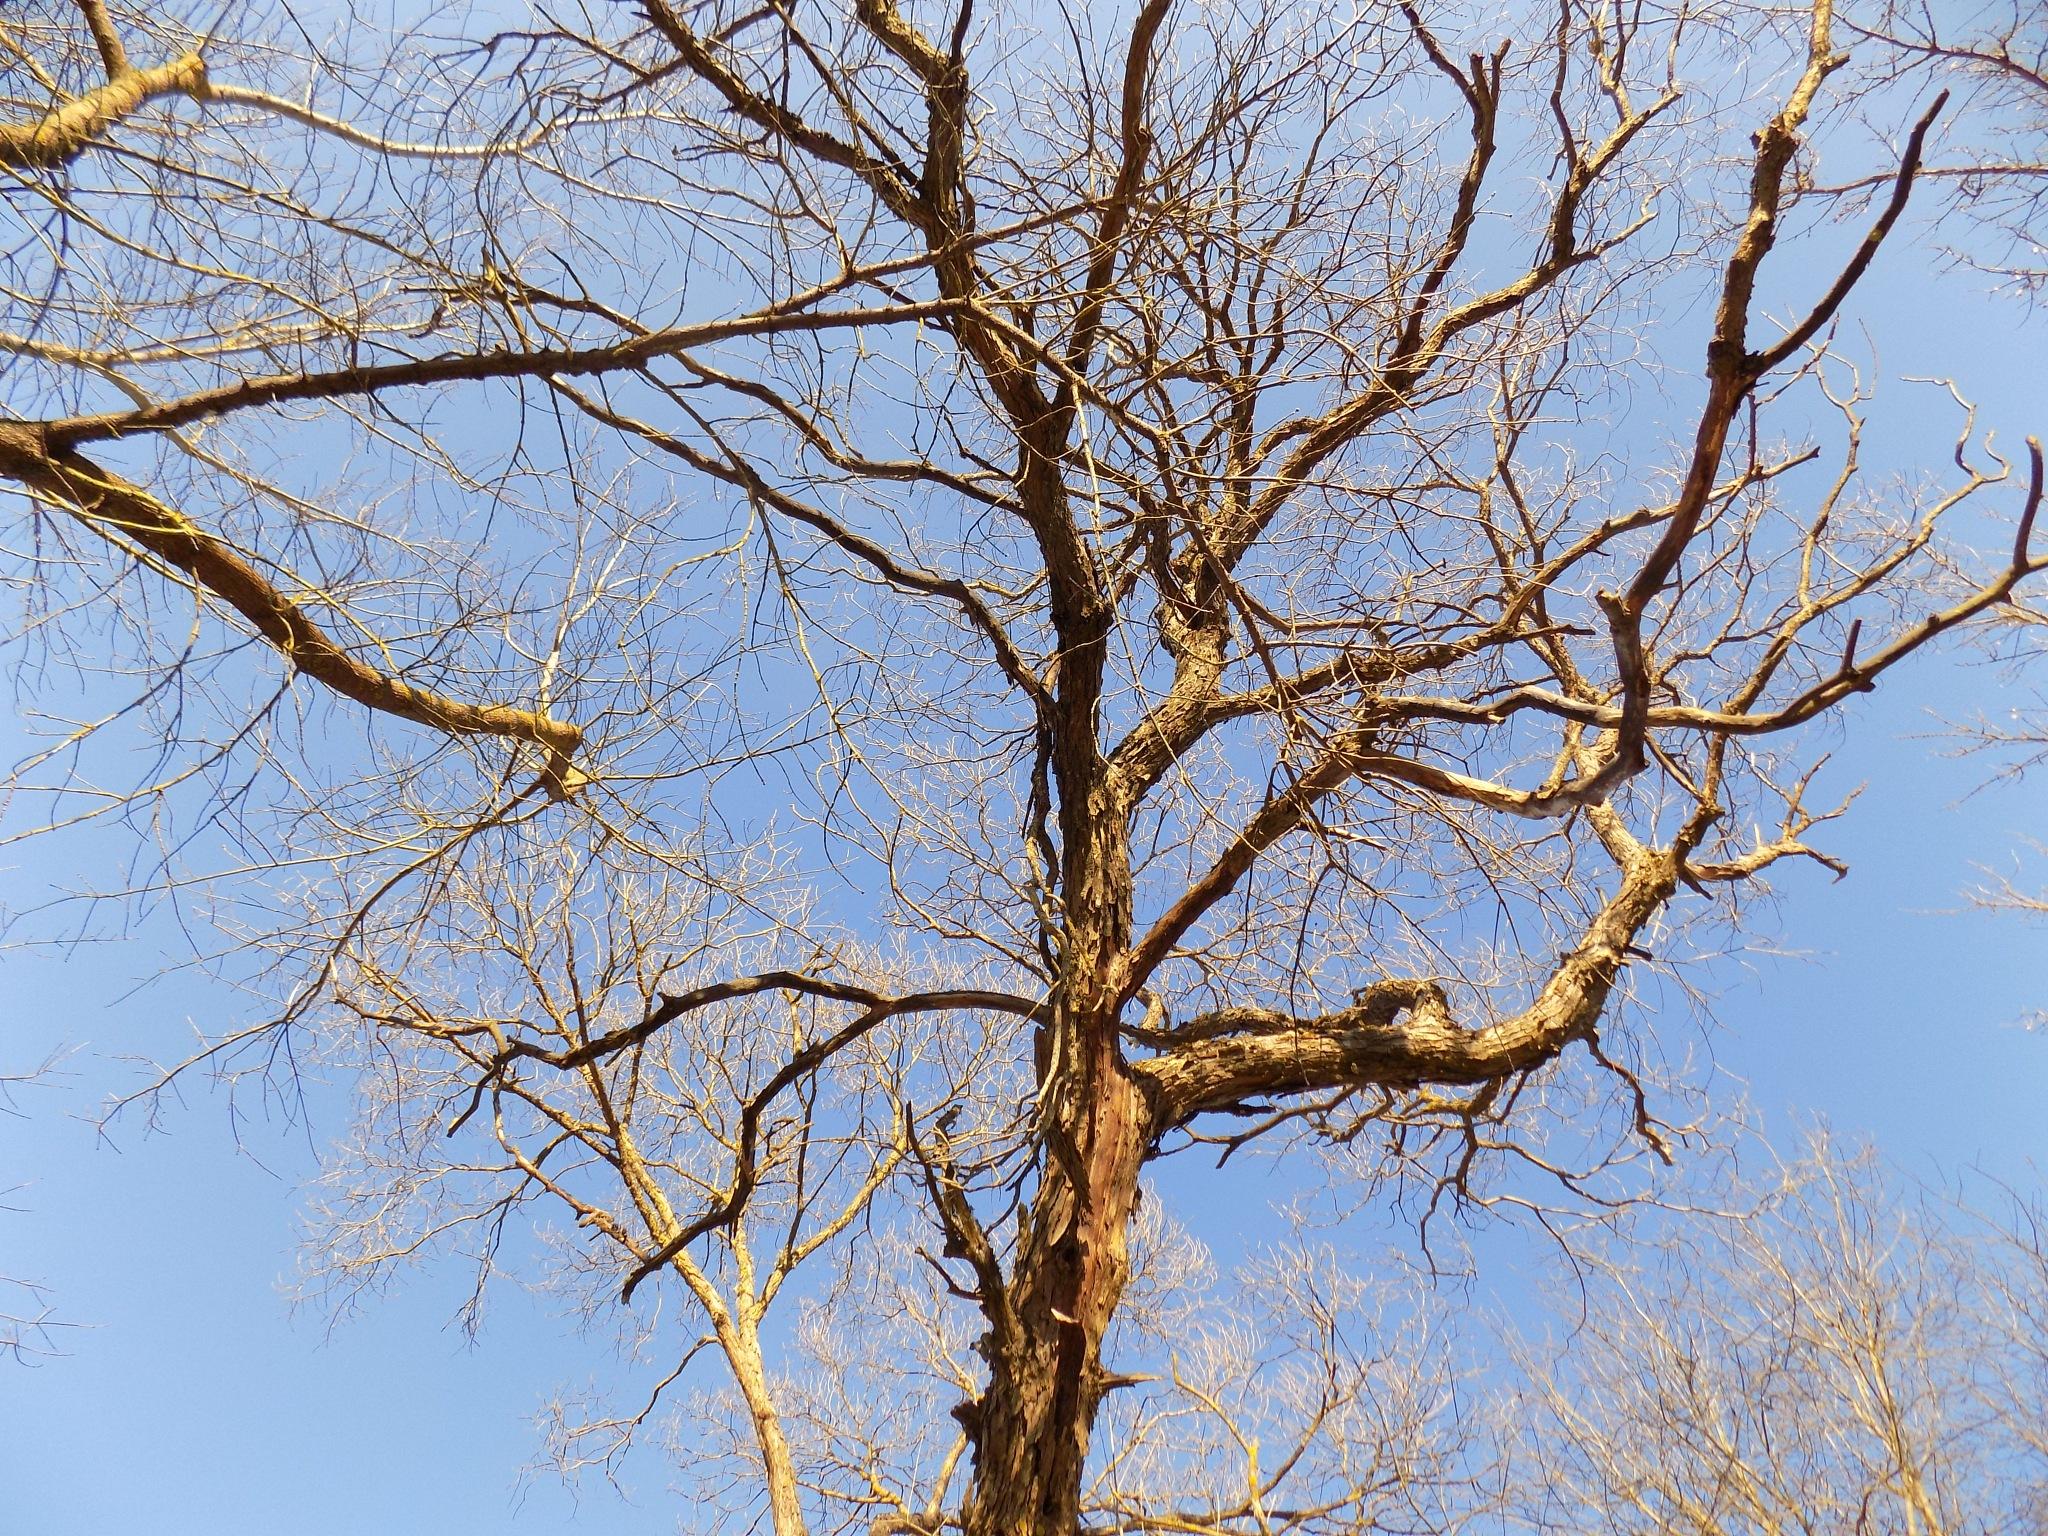 Dried tree by uzkuraitiene62